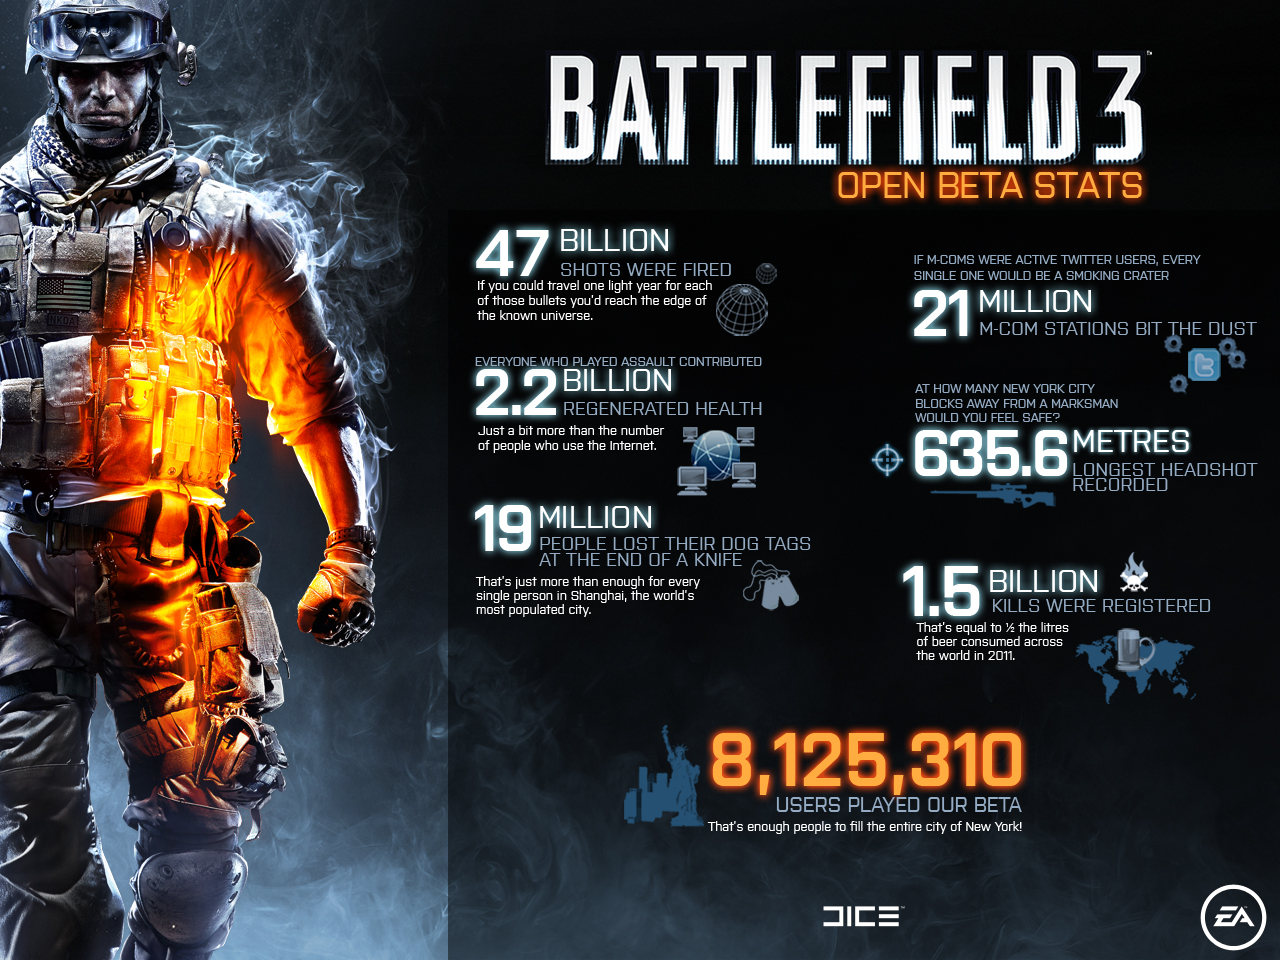 User blog:Maxwell123/DICE give us Interesting Battlefield 3 Beta